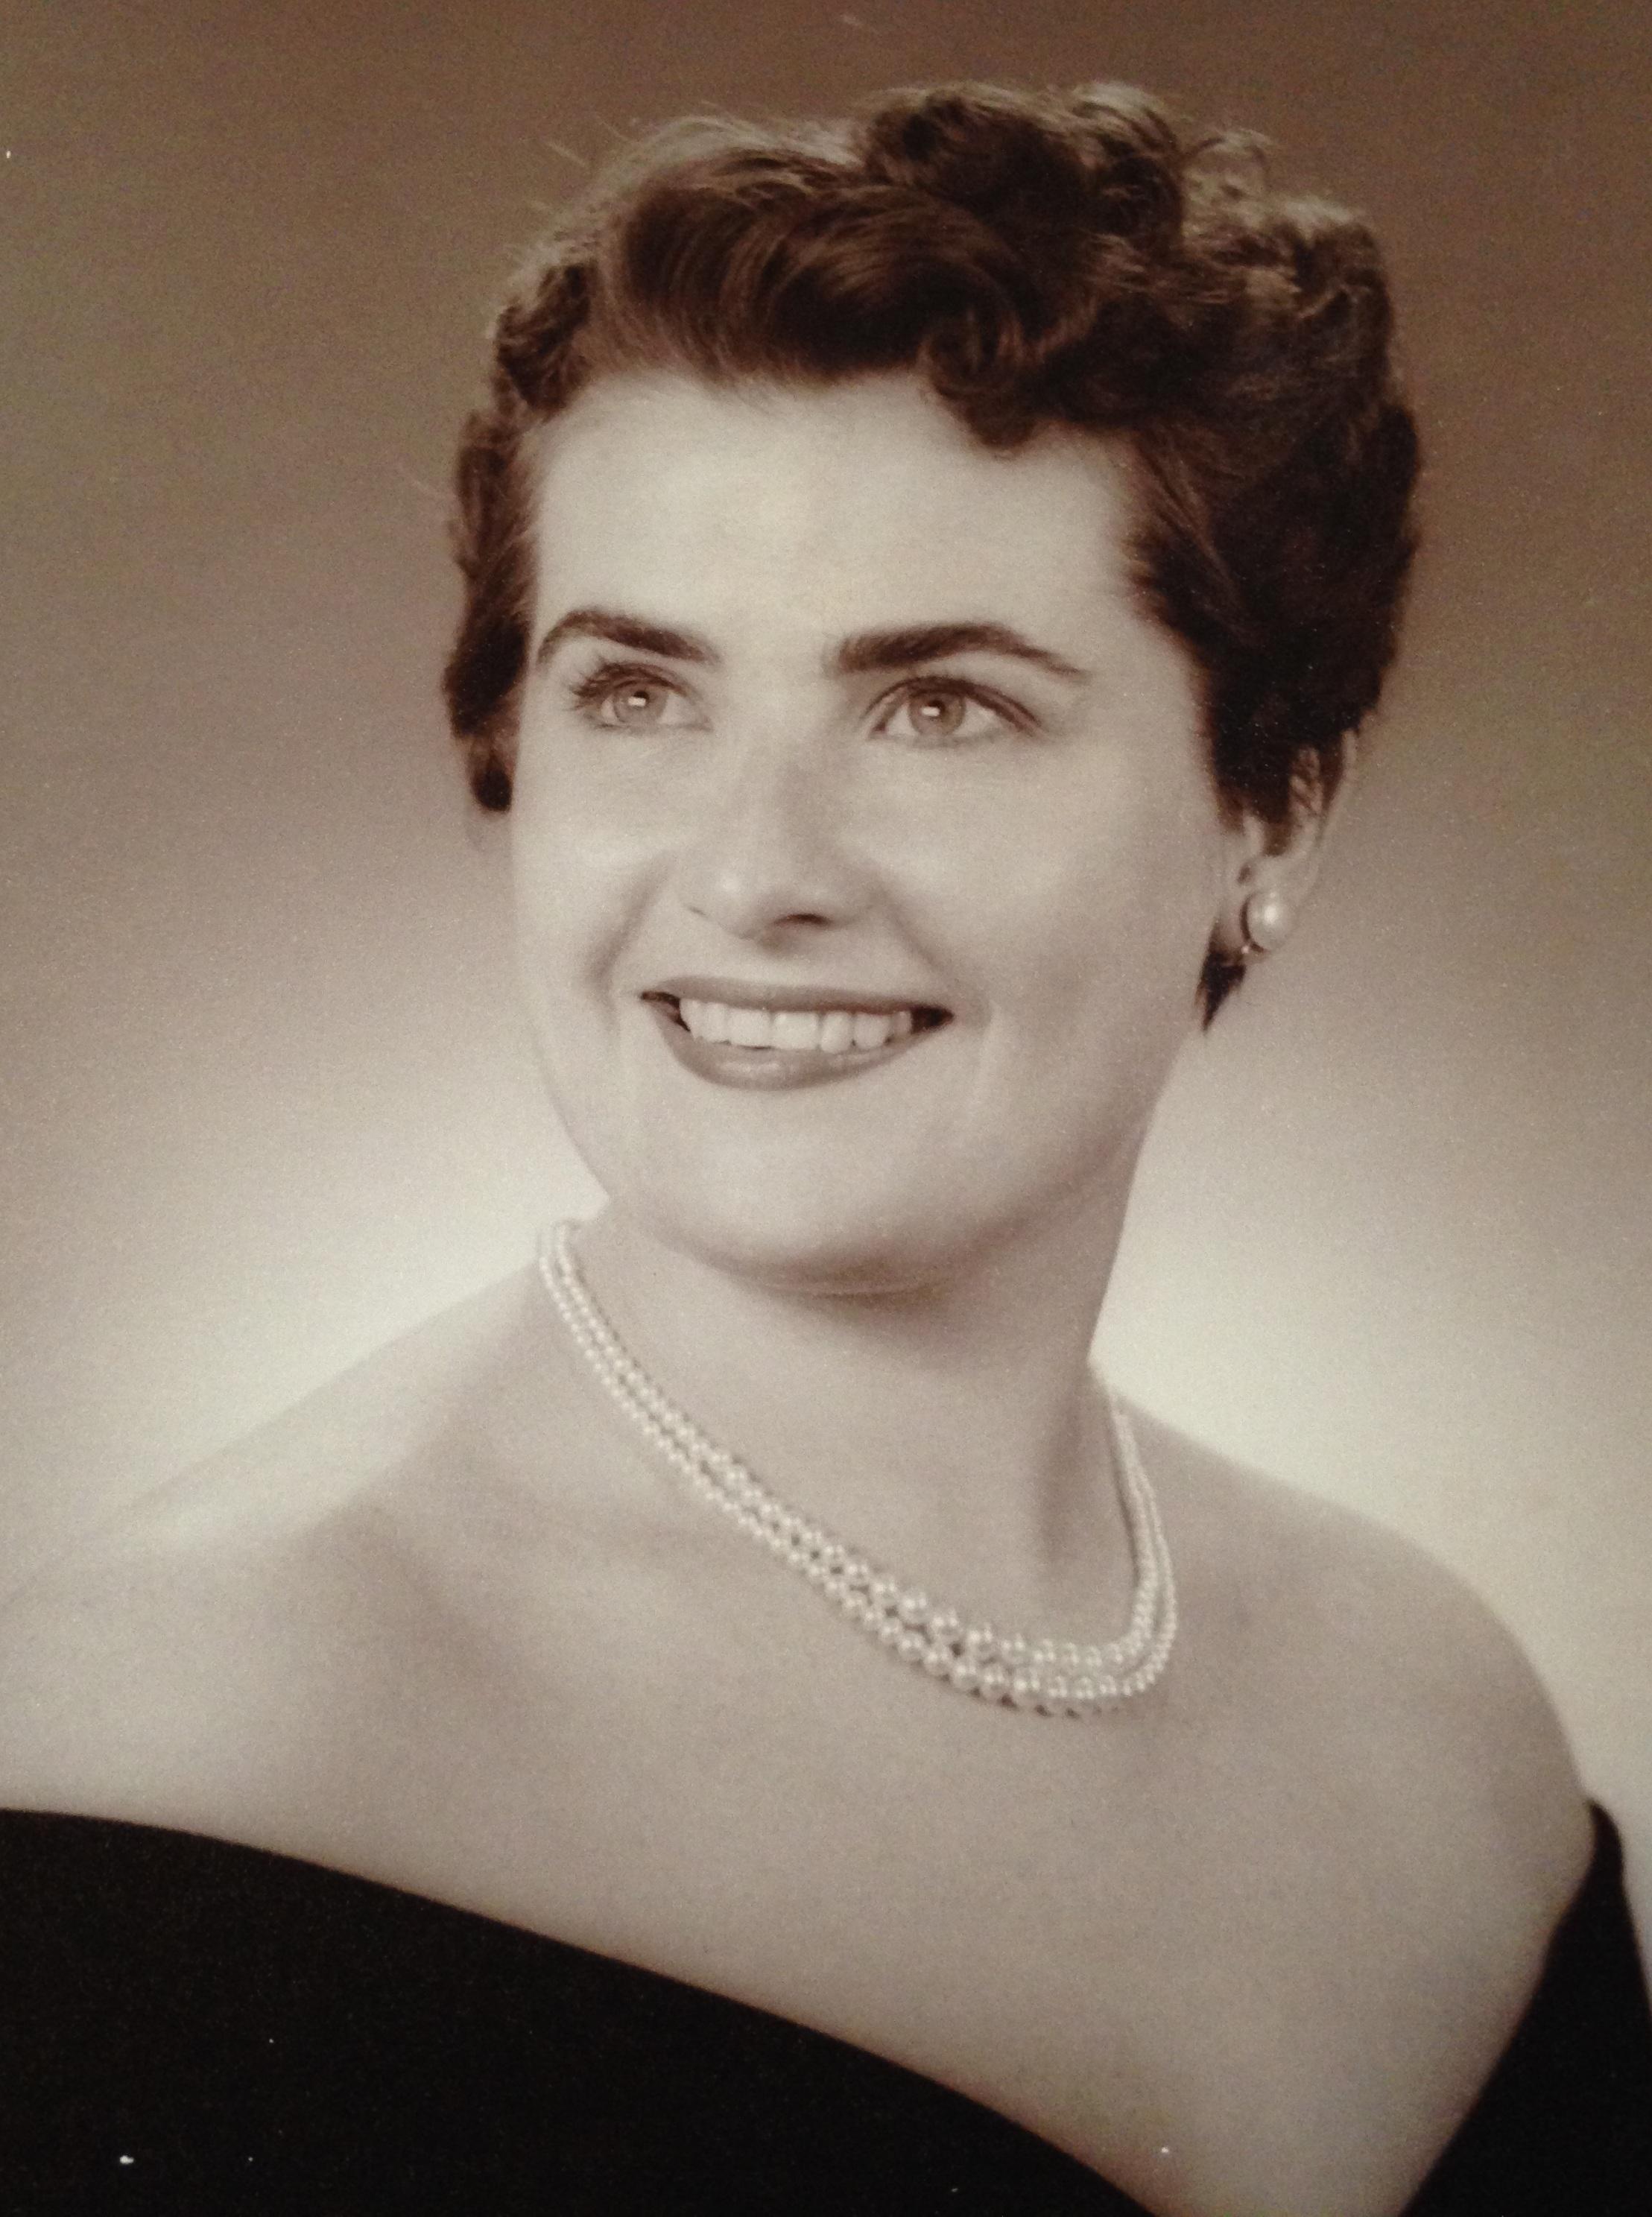 My Mother, Carol White 1957